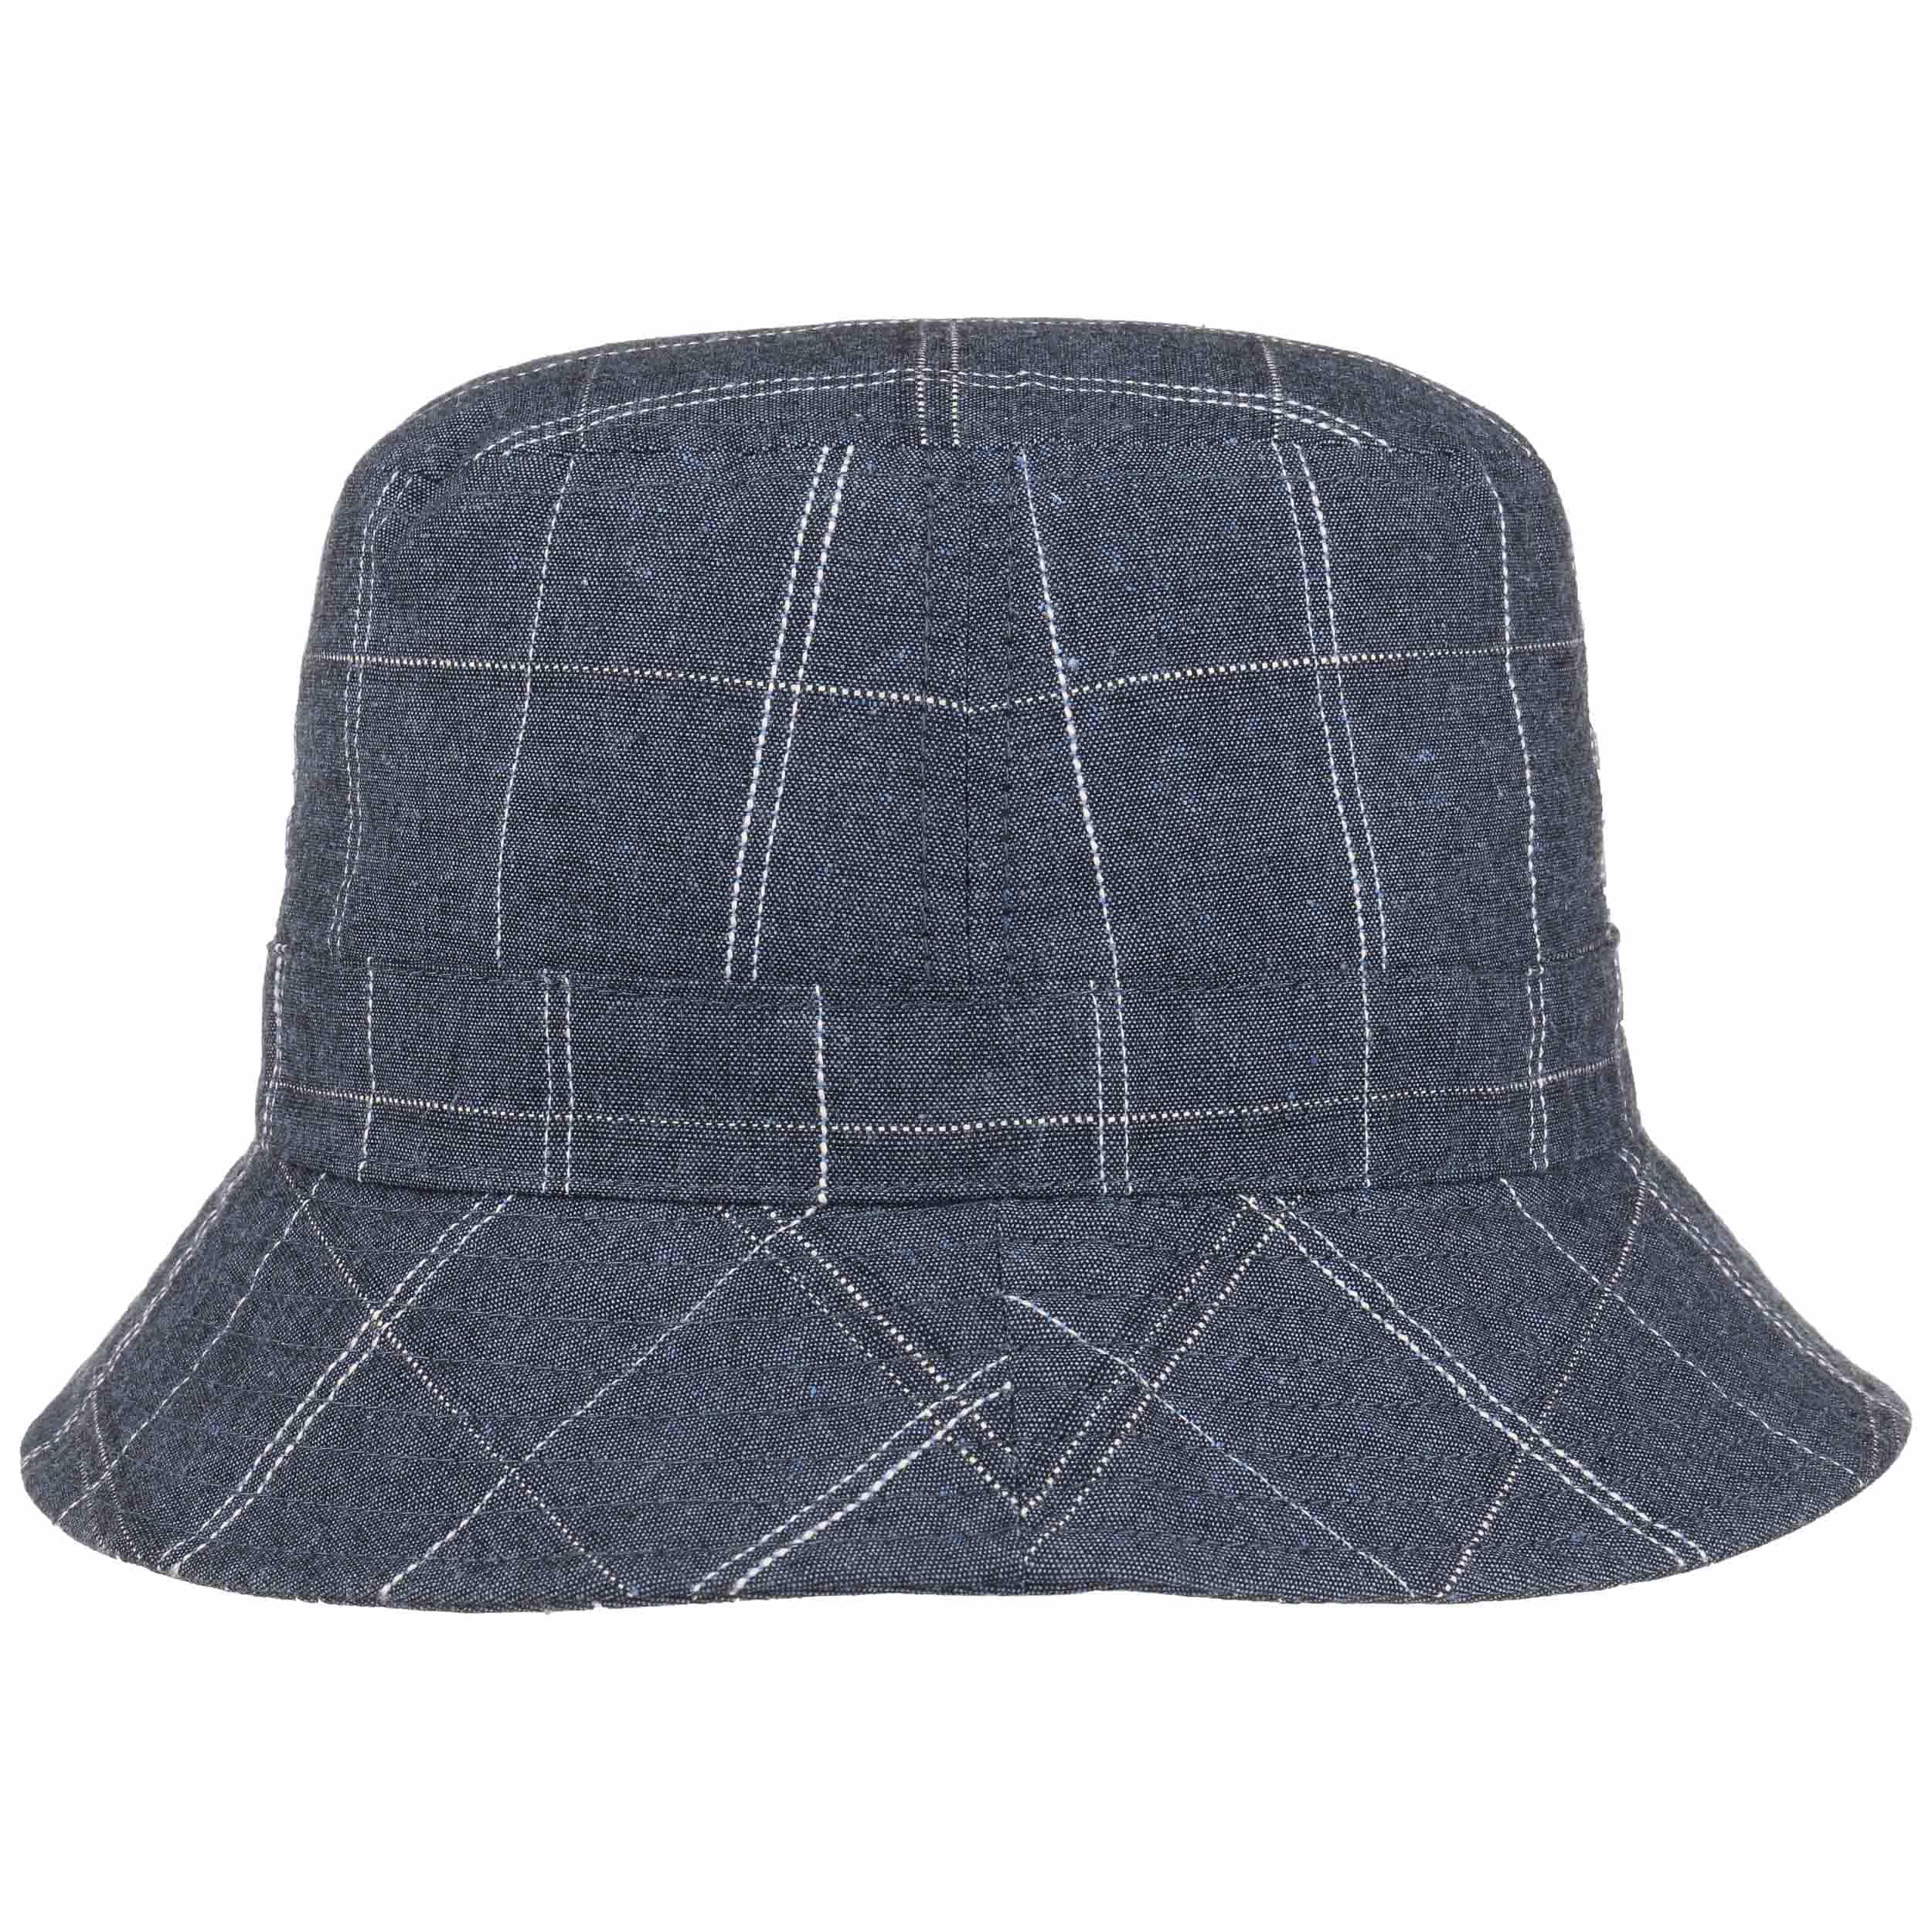 Classic Fedora Panama Hat by Lierys Sun hats Lierys pR0xK